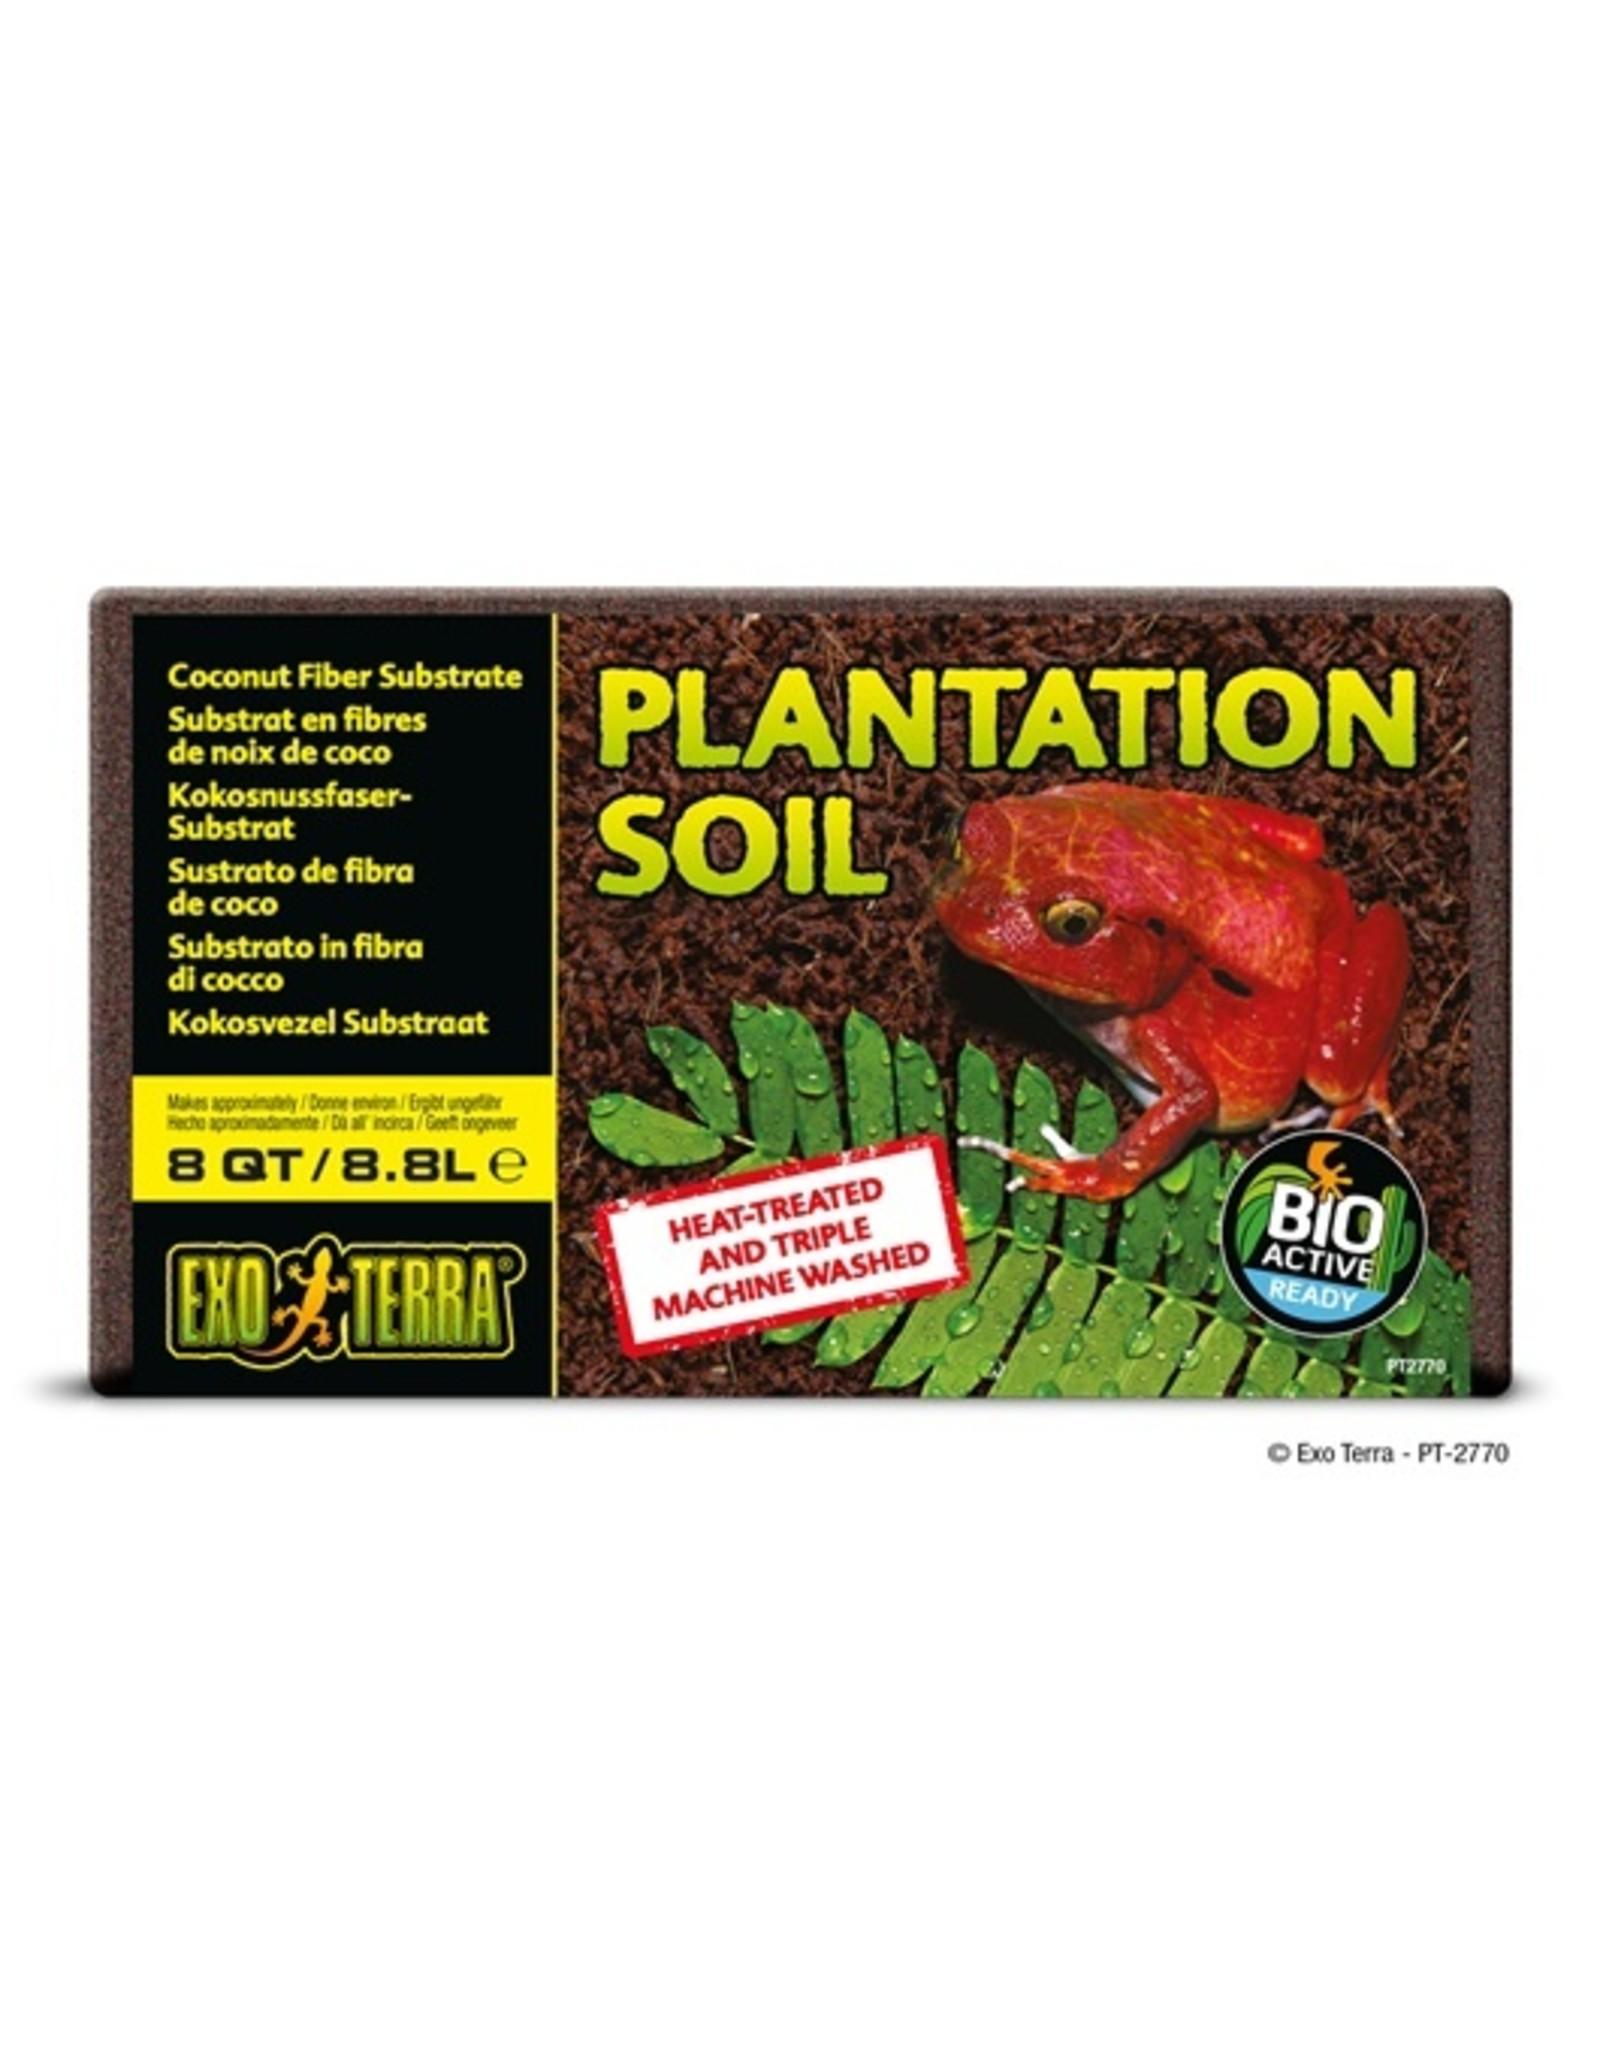 Exo Terra EXO TERRA Plantation Soil Substrate Brick